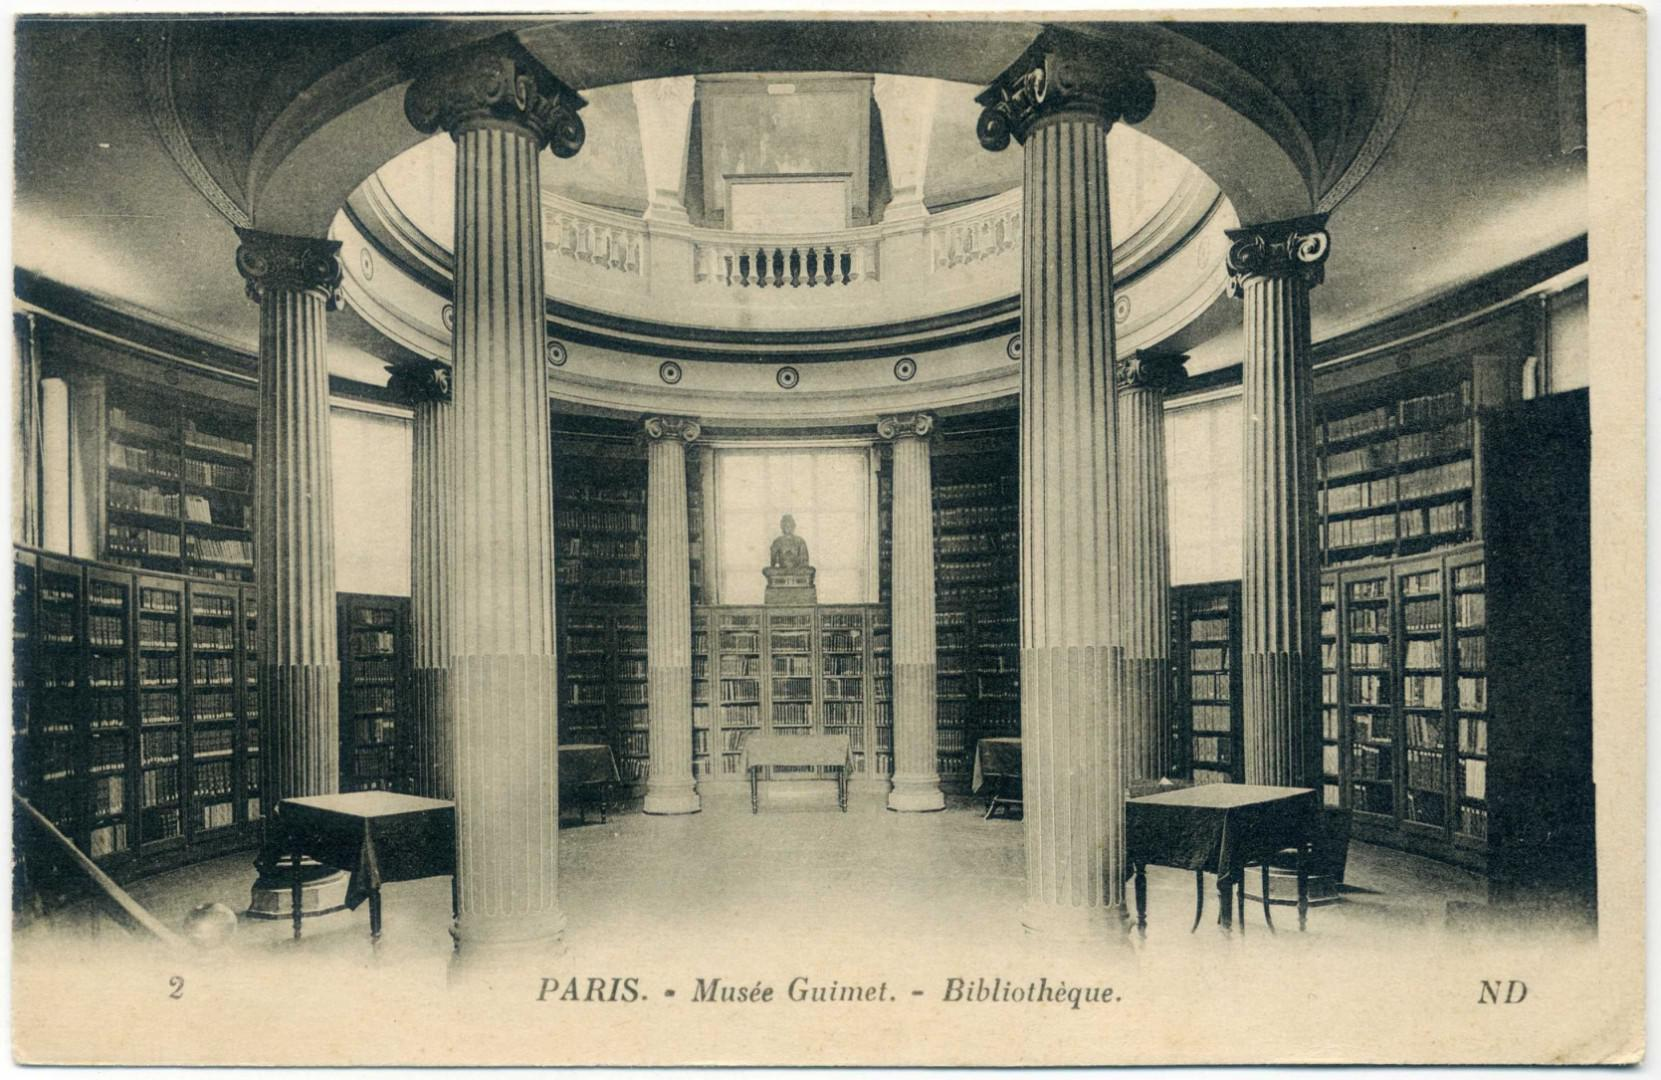 Paris Musee Guimet Bibliotheque